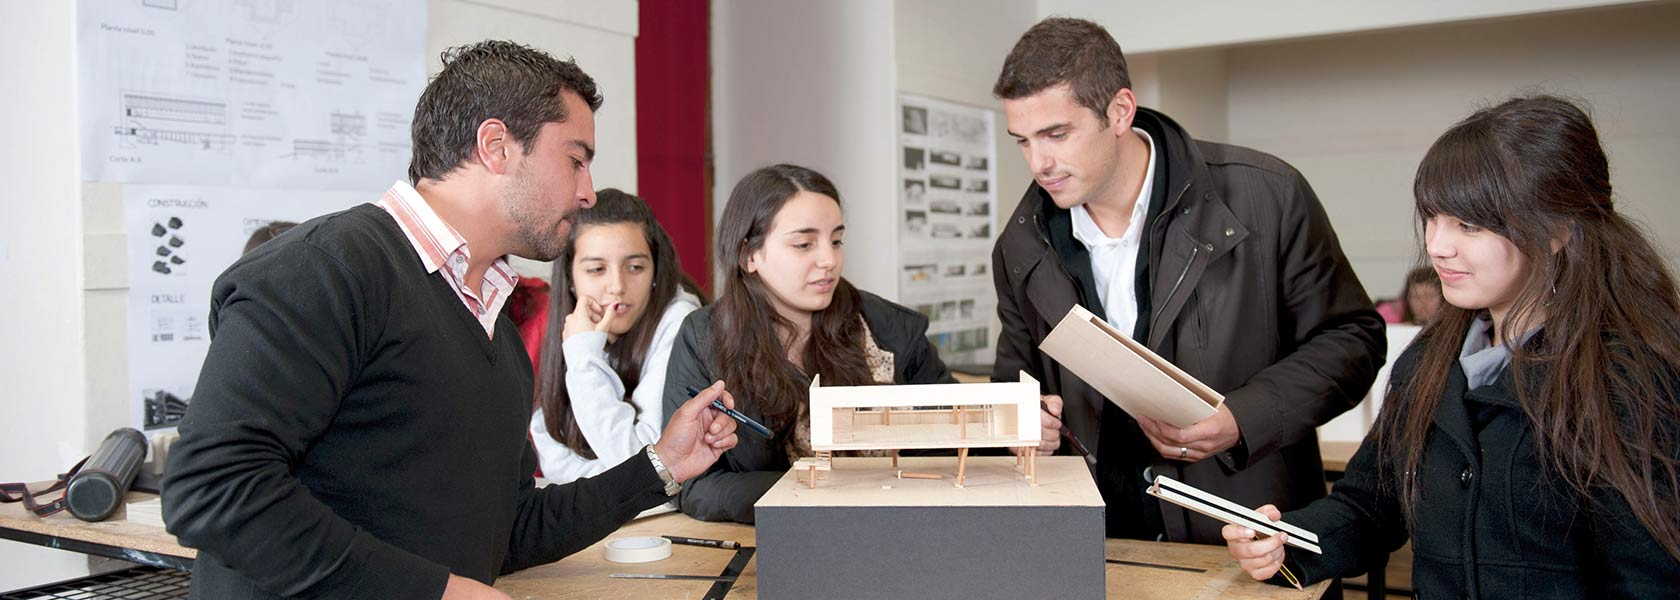 Carrera arquitectura santiago universidad mayor for Carreras de arquitectura